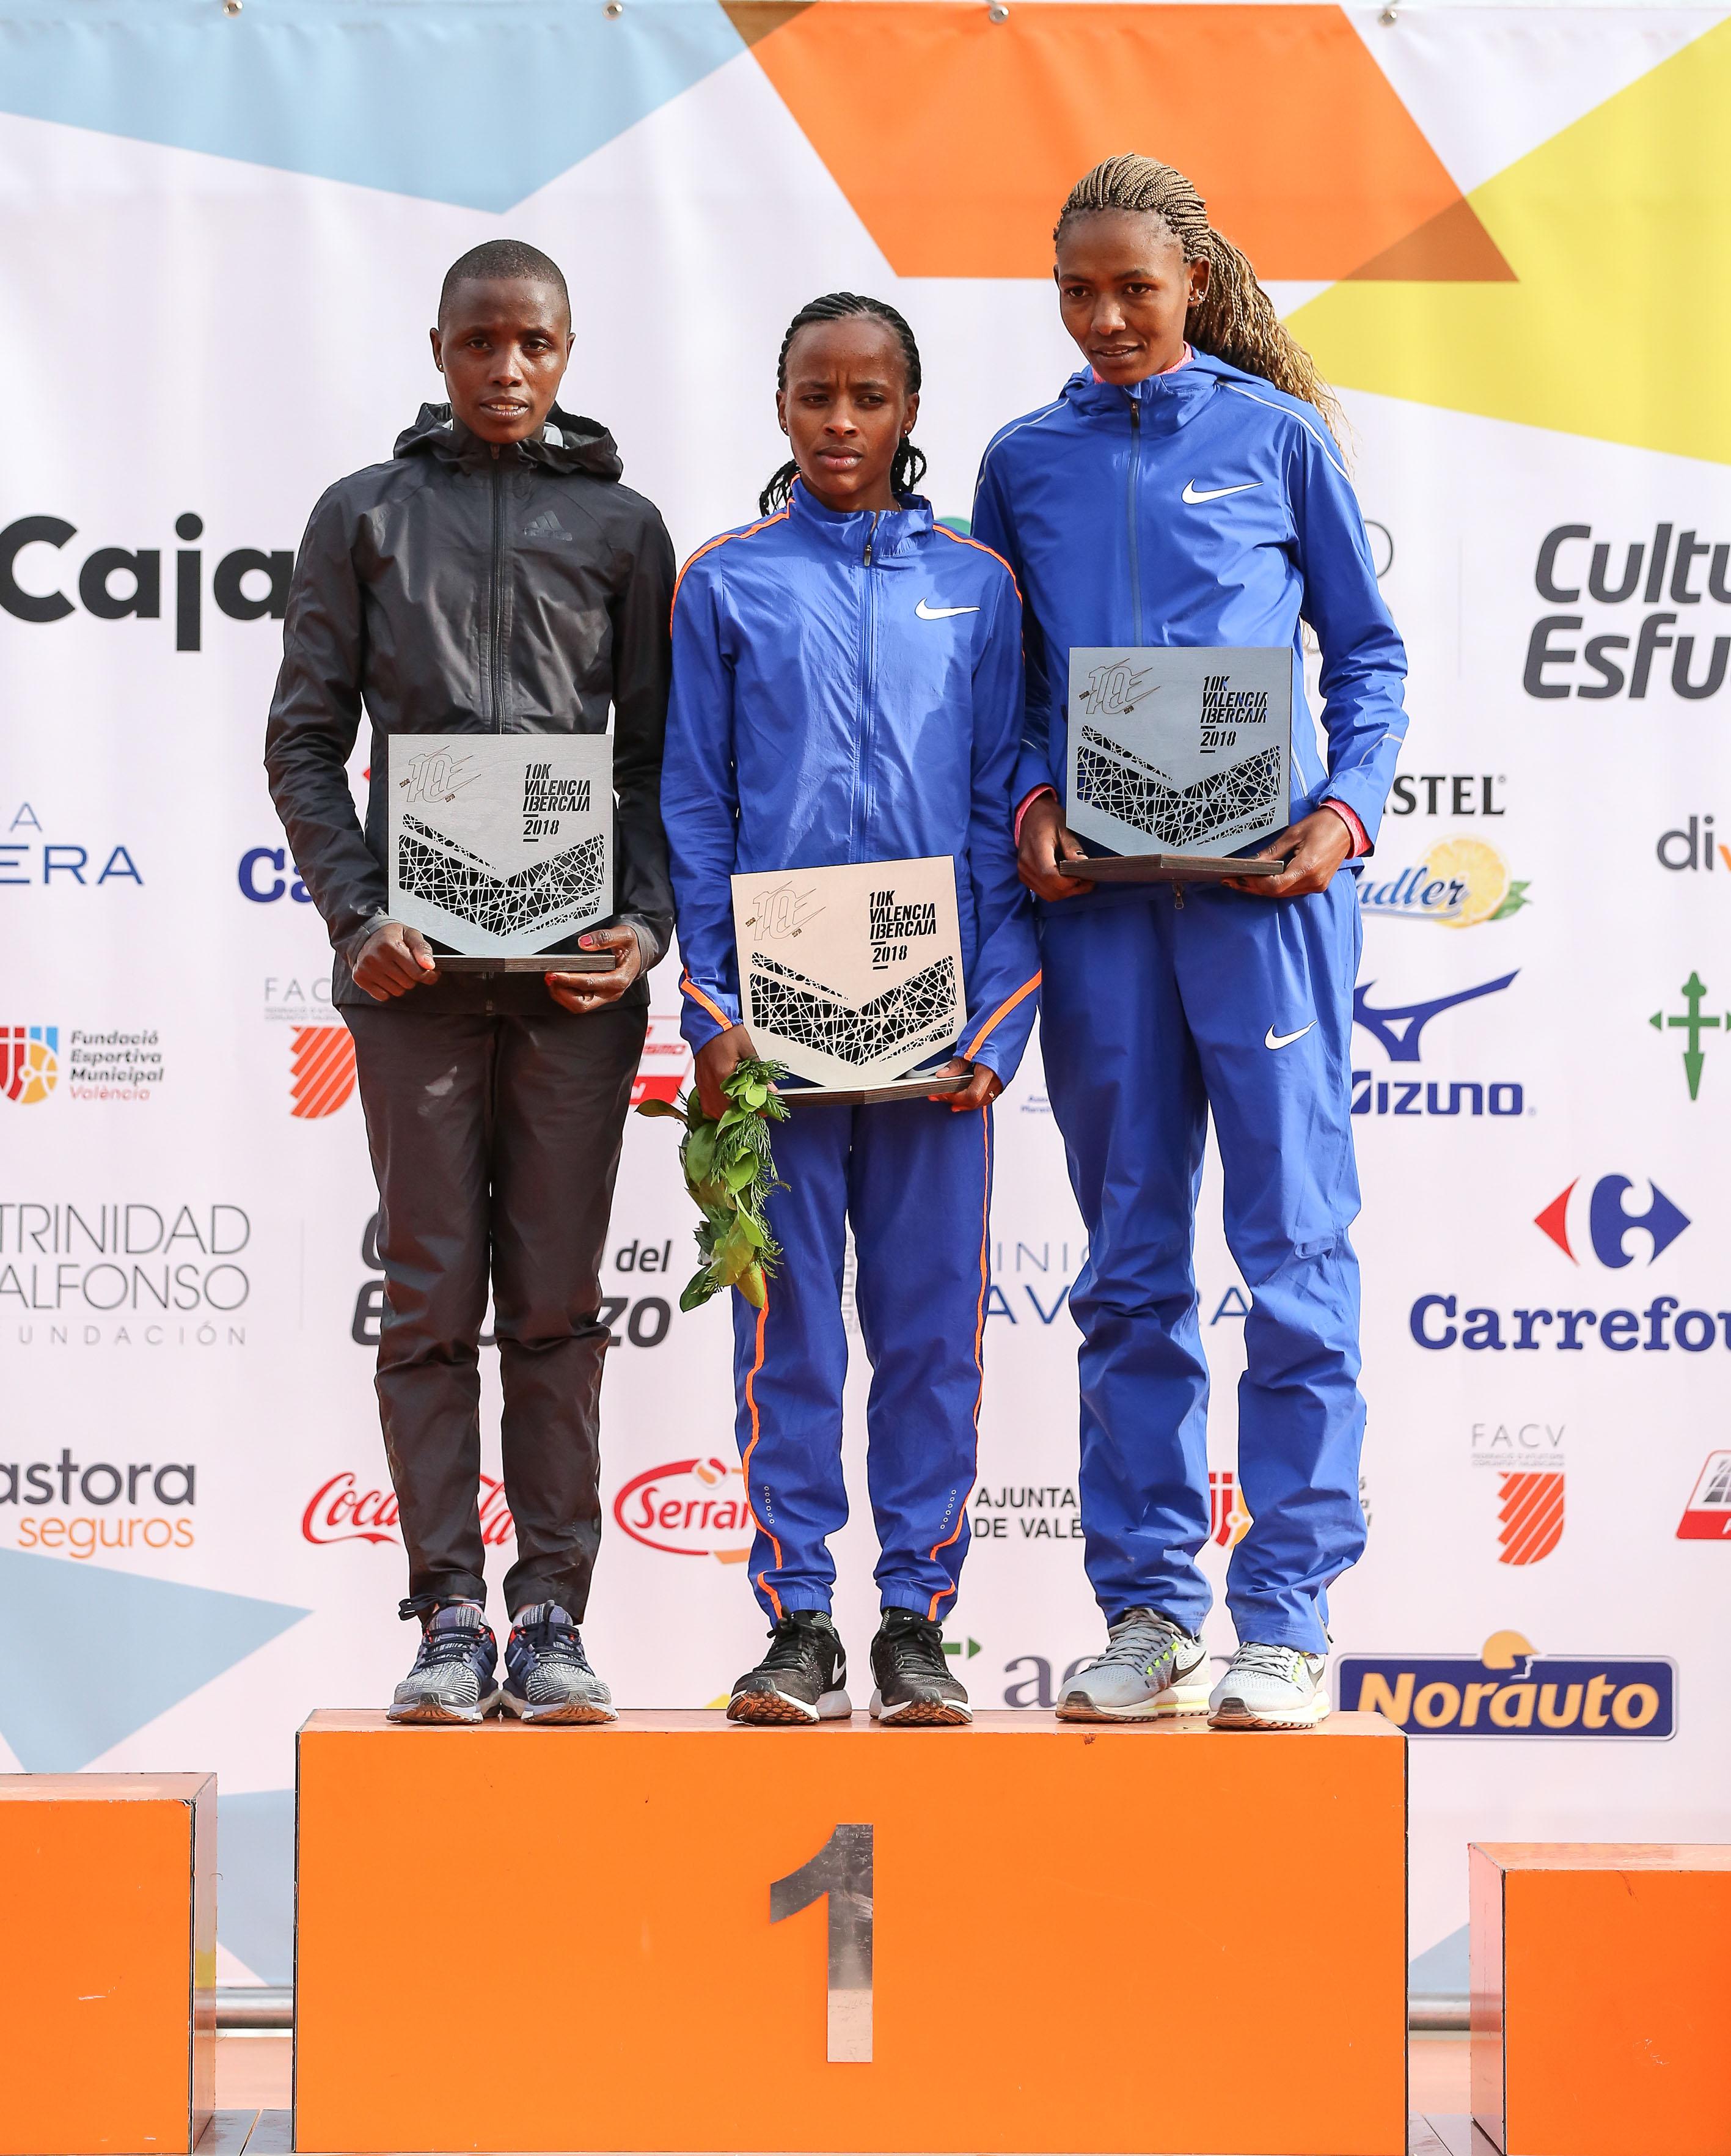 Ganadoras 10K Valencia 2018